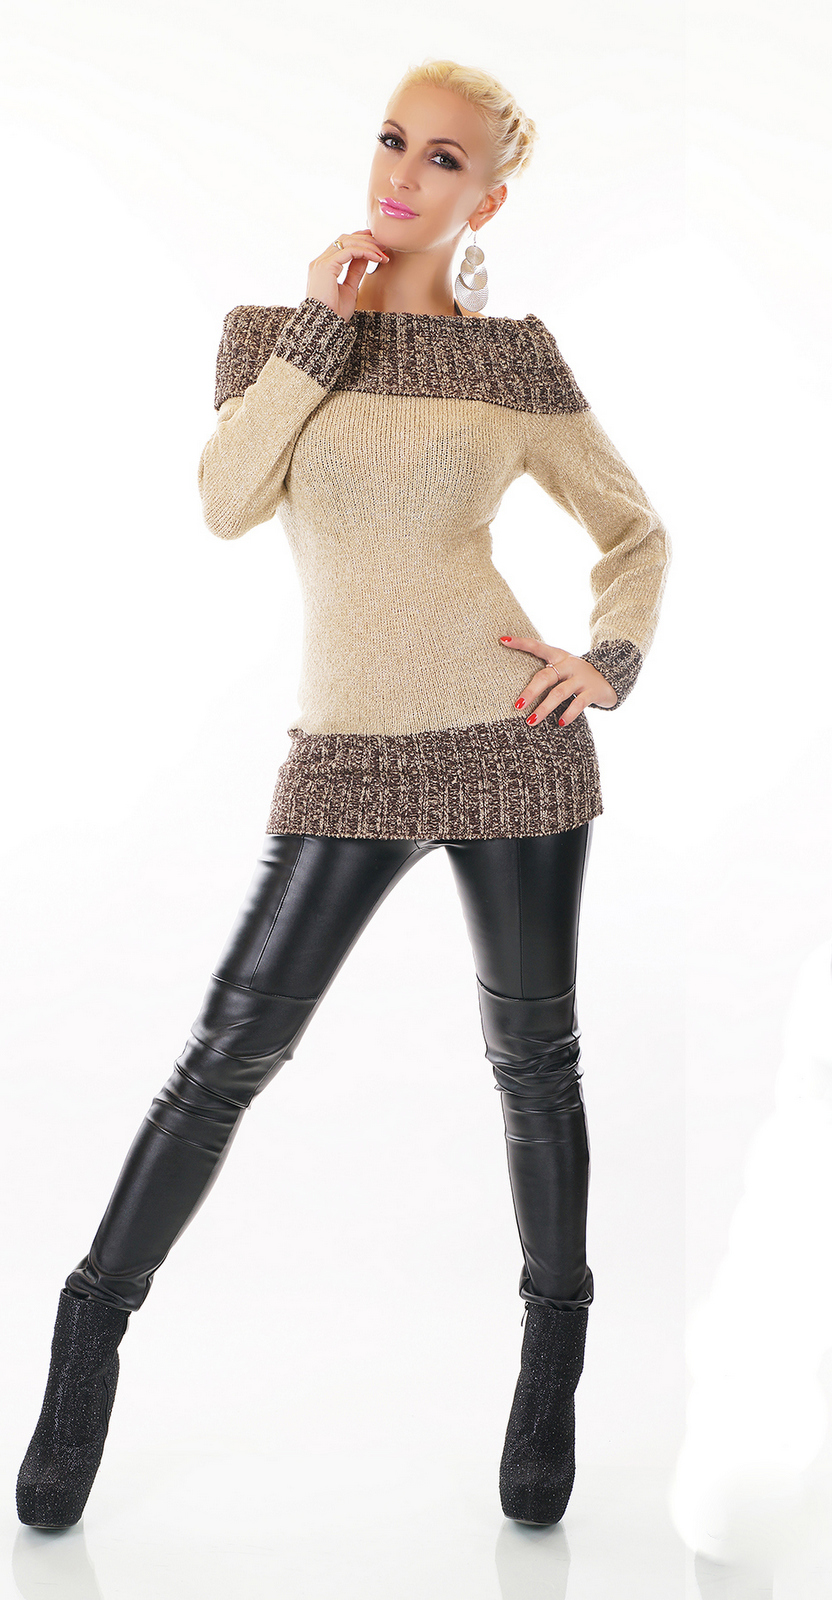 Dámský luxusní dlouhý svetr ebcac164b1